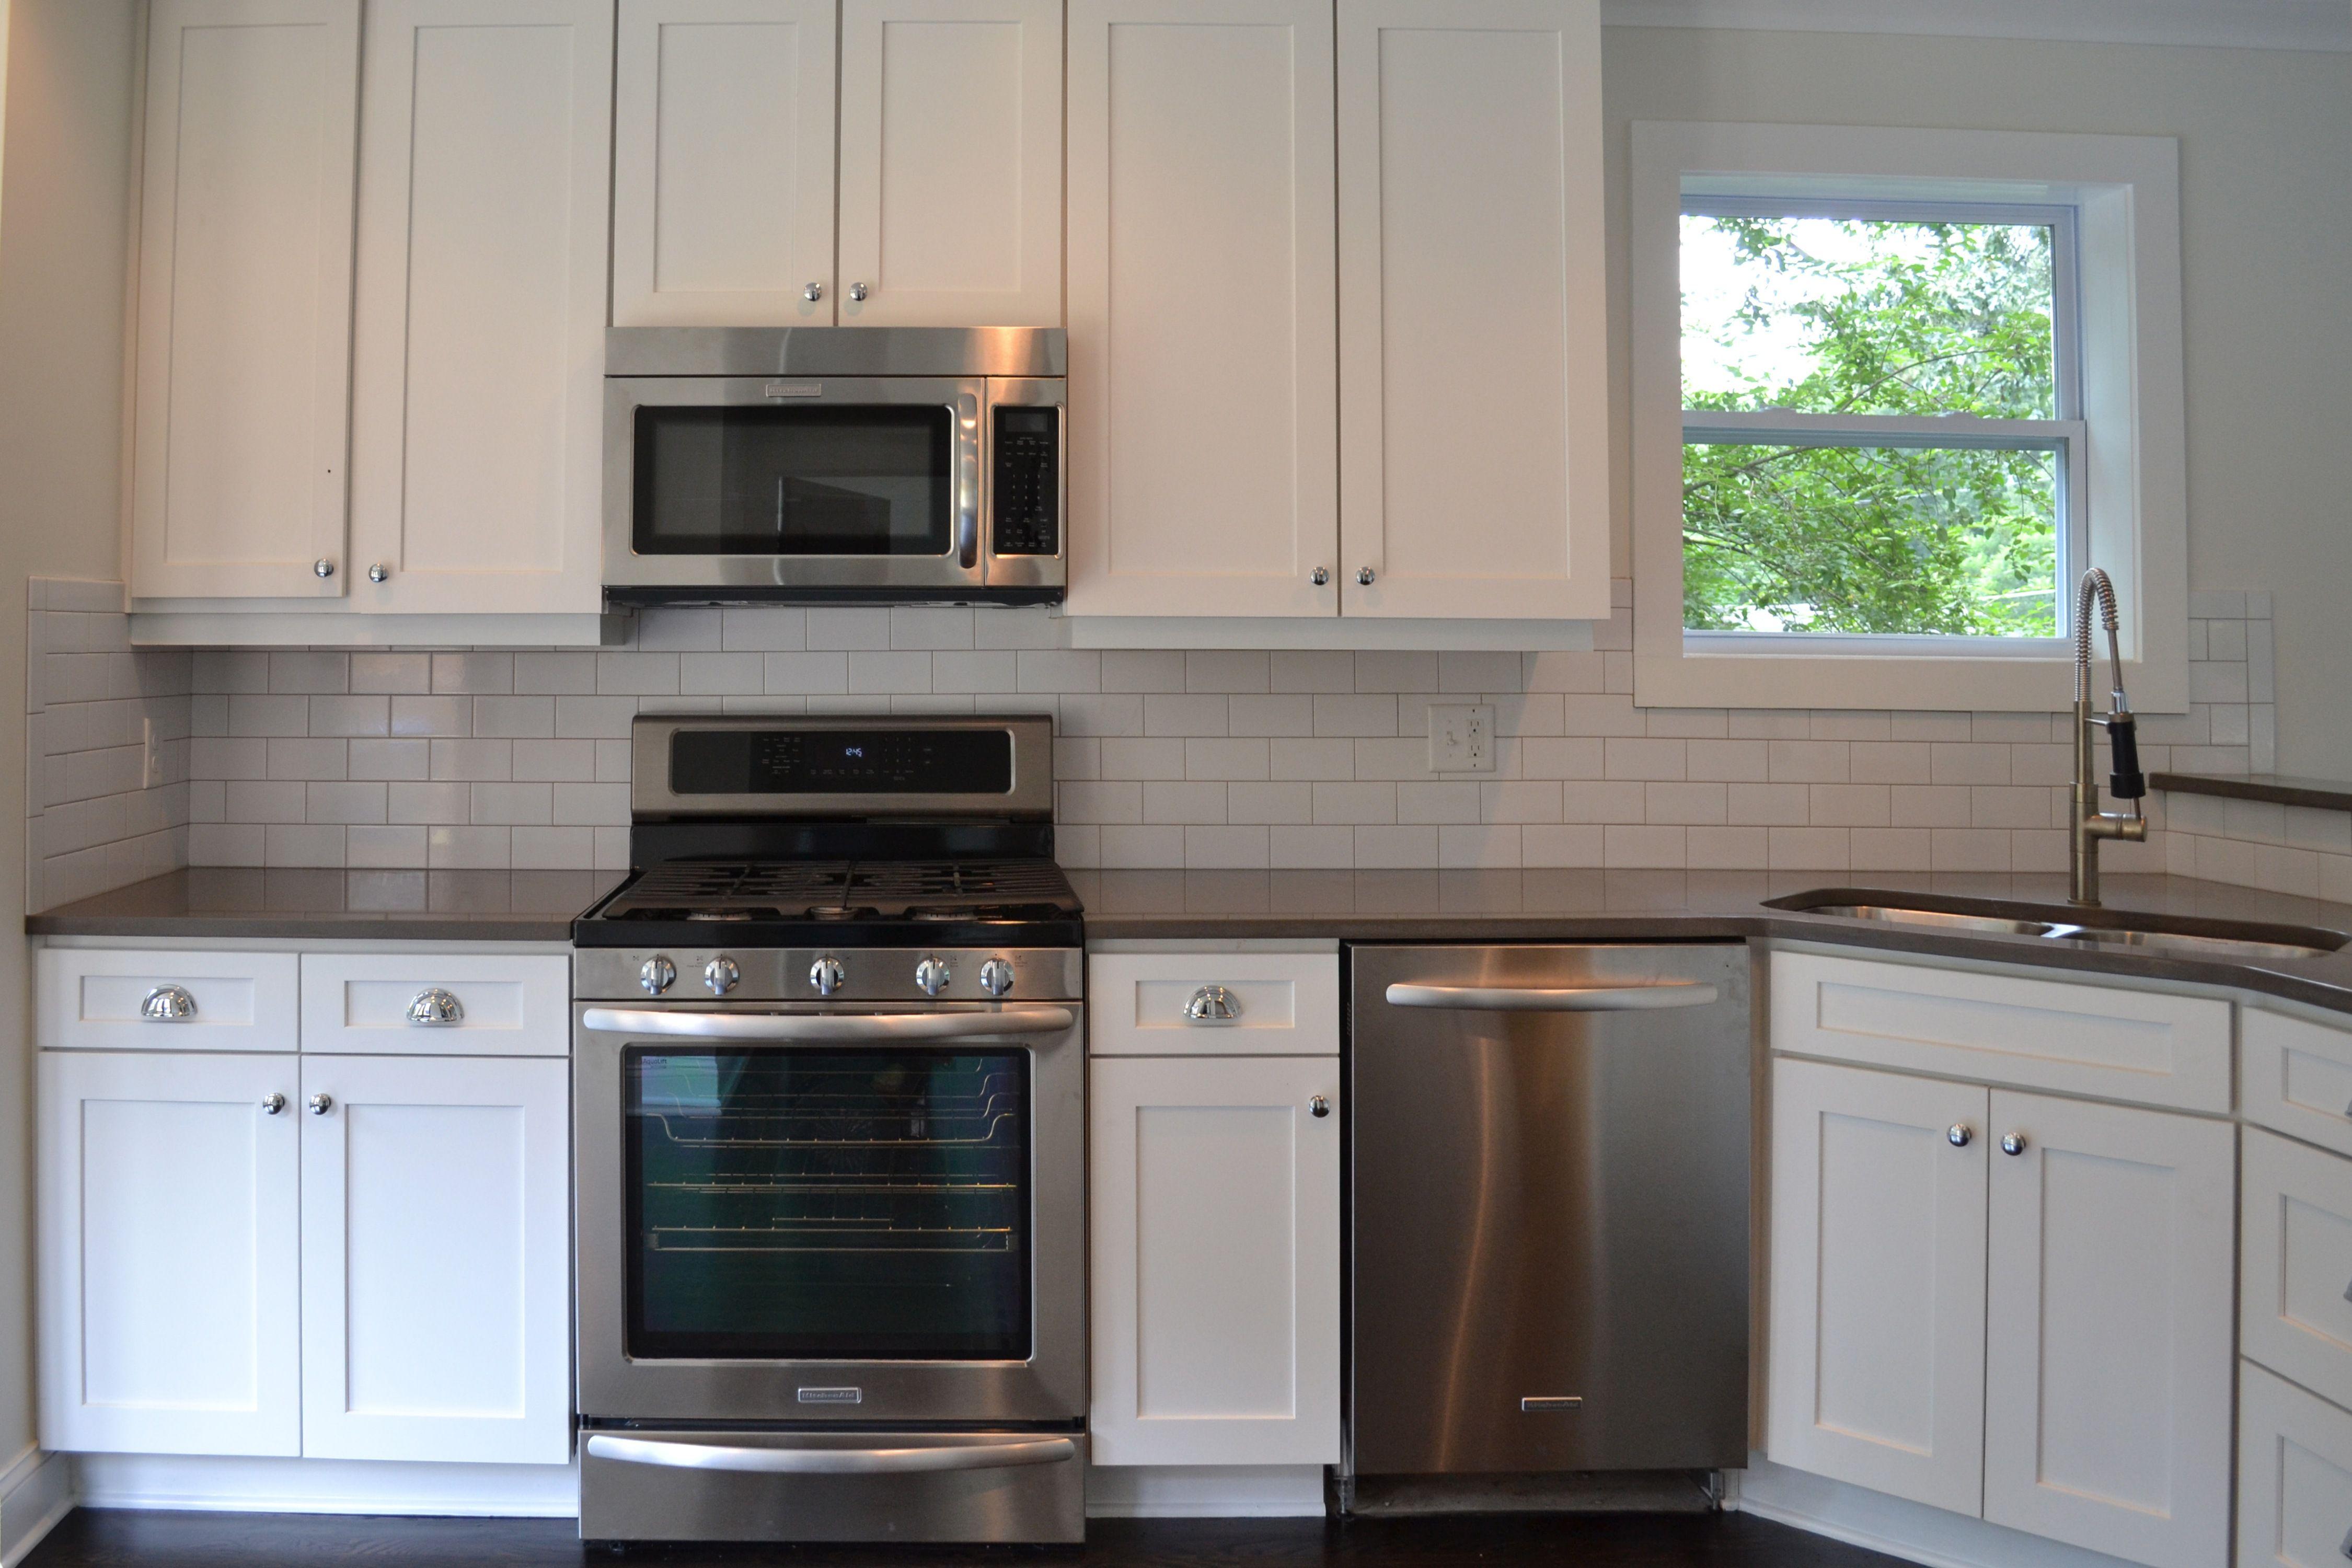 Quartz Backsplash Perfect Design Countertops   Subway Tle Vision Pointe Homes